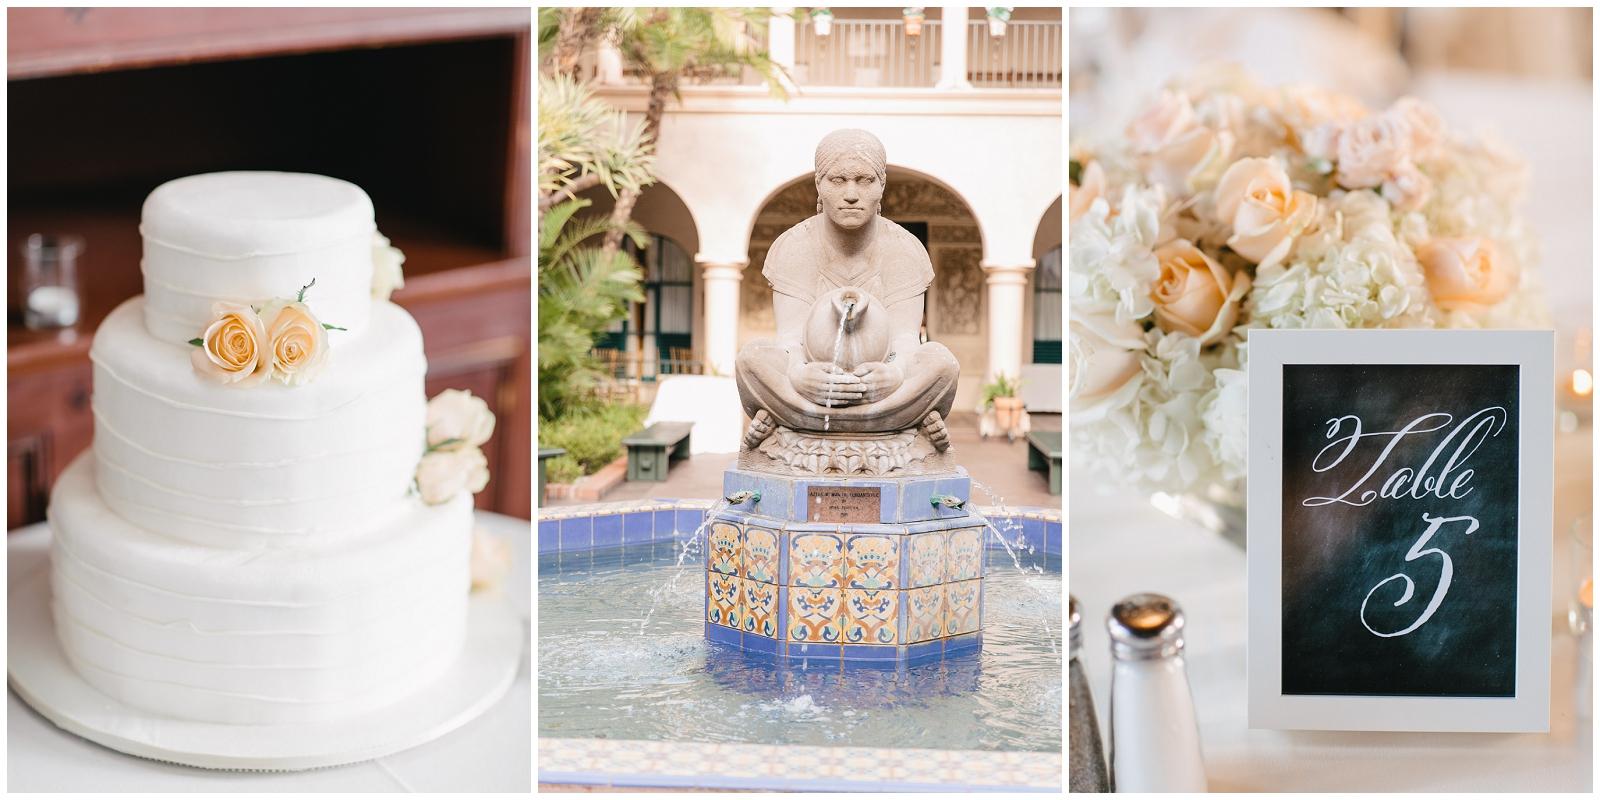 San-Francisco-Bay-Area-Wedding-Photography-Destination-19.jpg